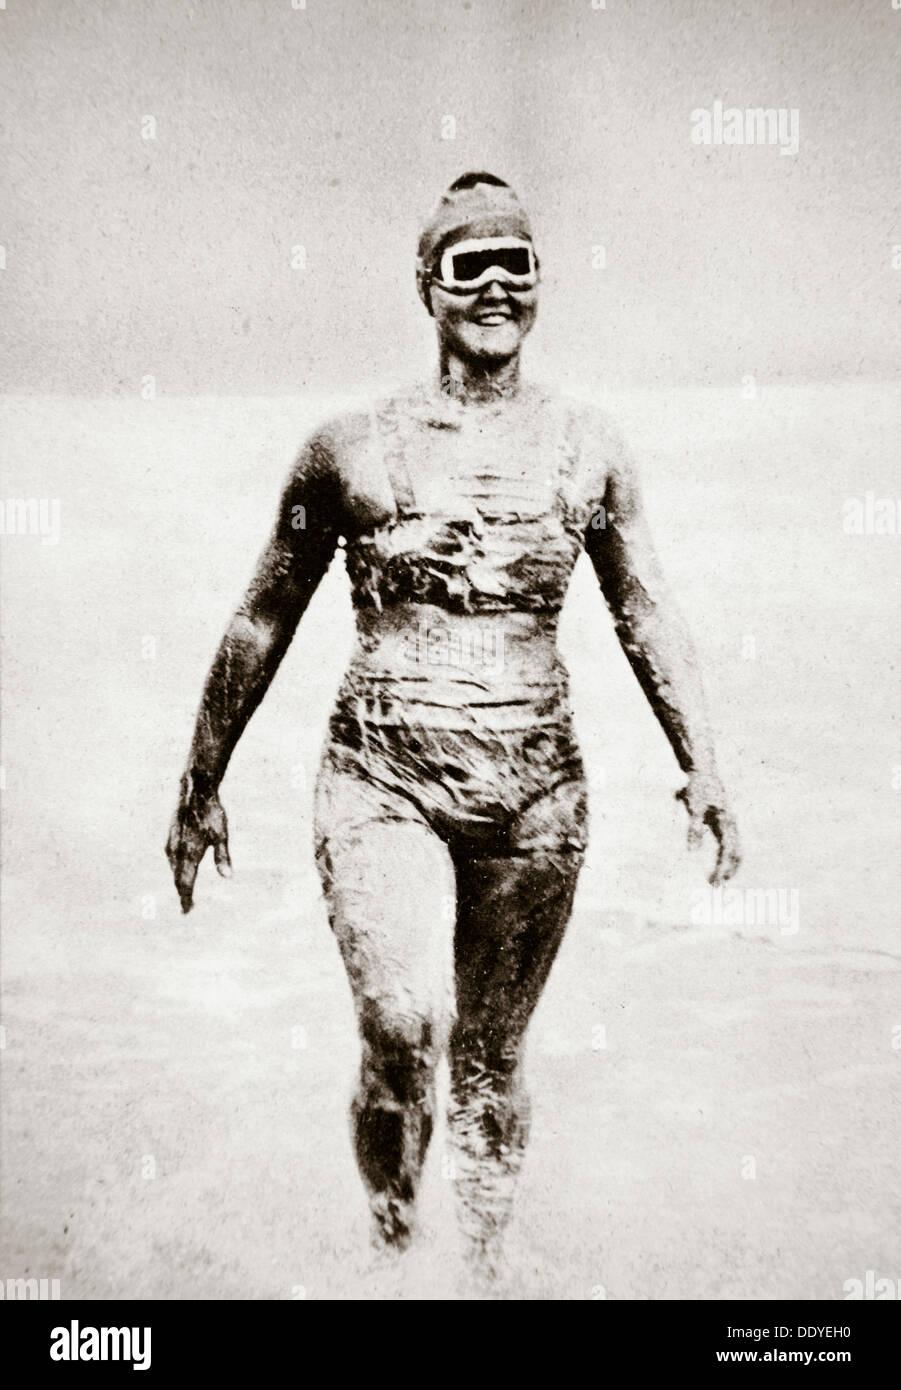 Gertrude Ederle, American nuotatore, 1926. Artista: sconosciuto Immagini Stock